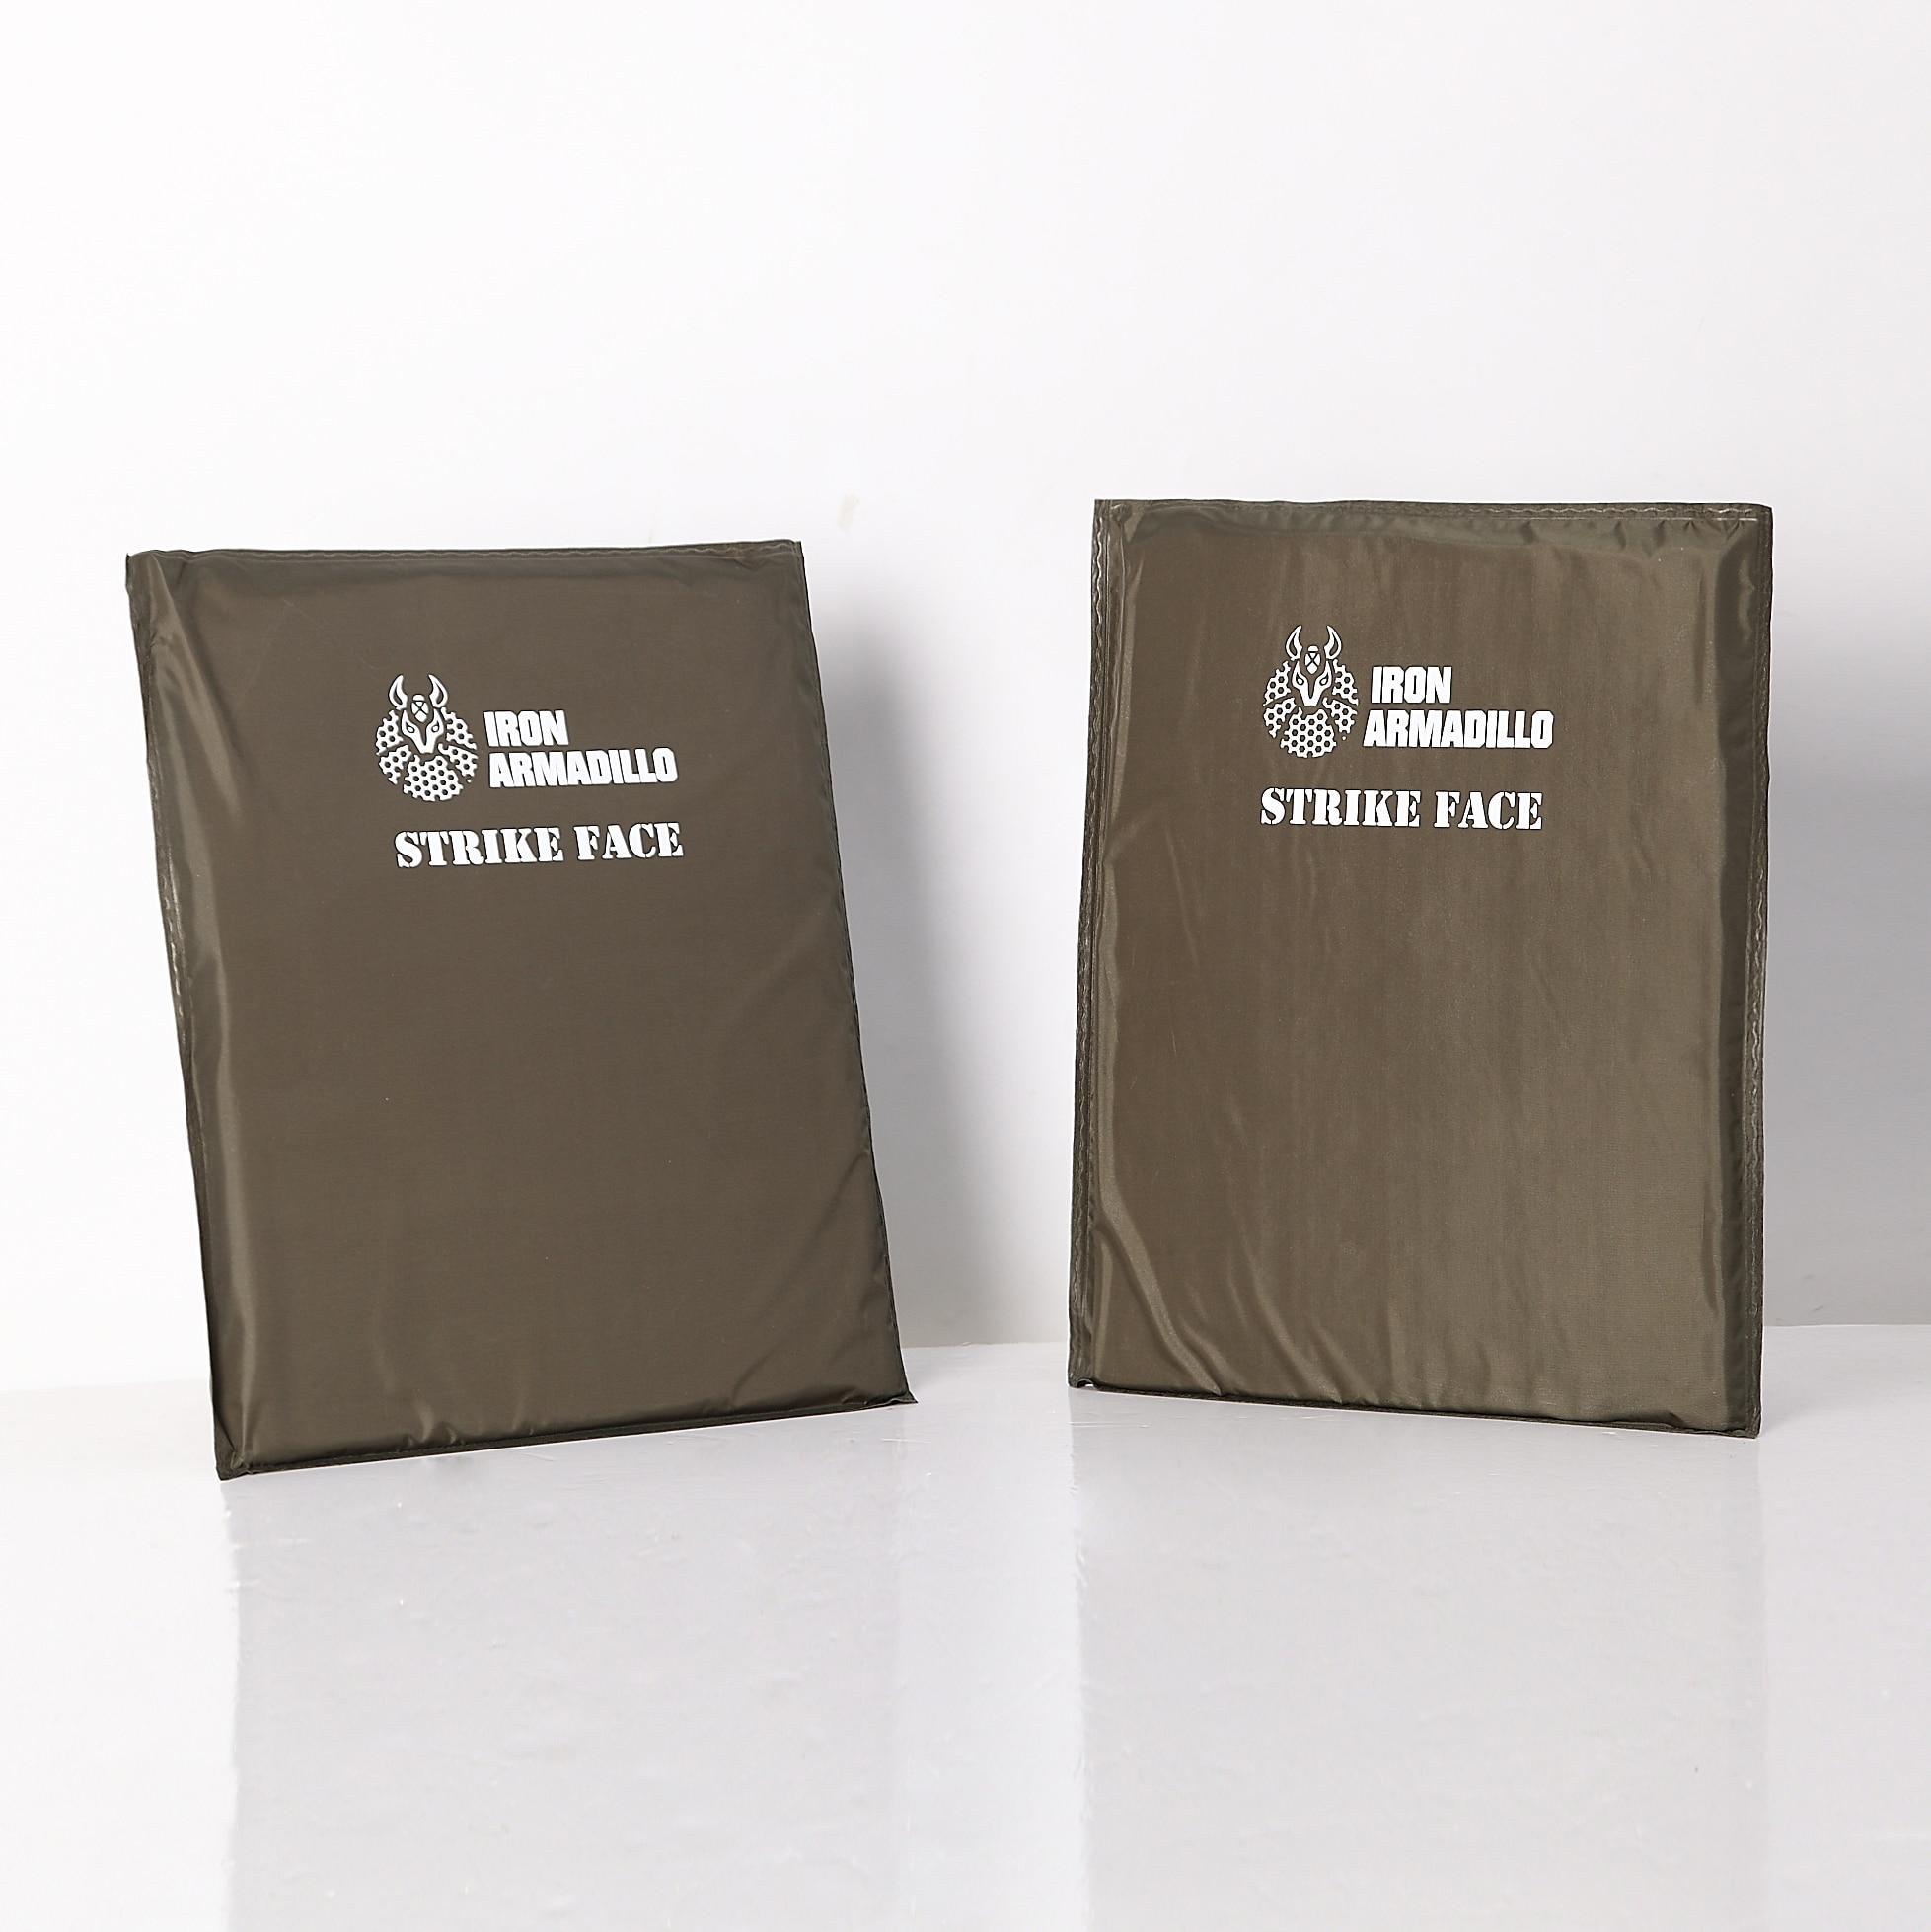 AA Shield Bulletproof Soft Panel Body Armor Inserts Plate UHMWPE Core Self Defense Supply Ballistic NIJ Lvl IIIA 3A 11x14 Pair